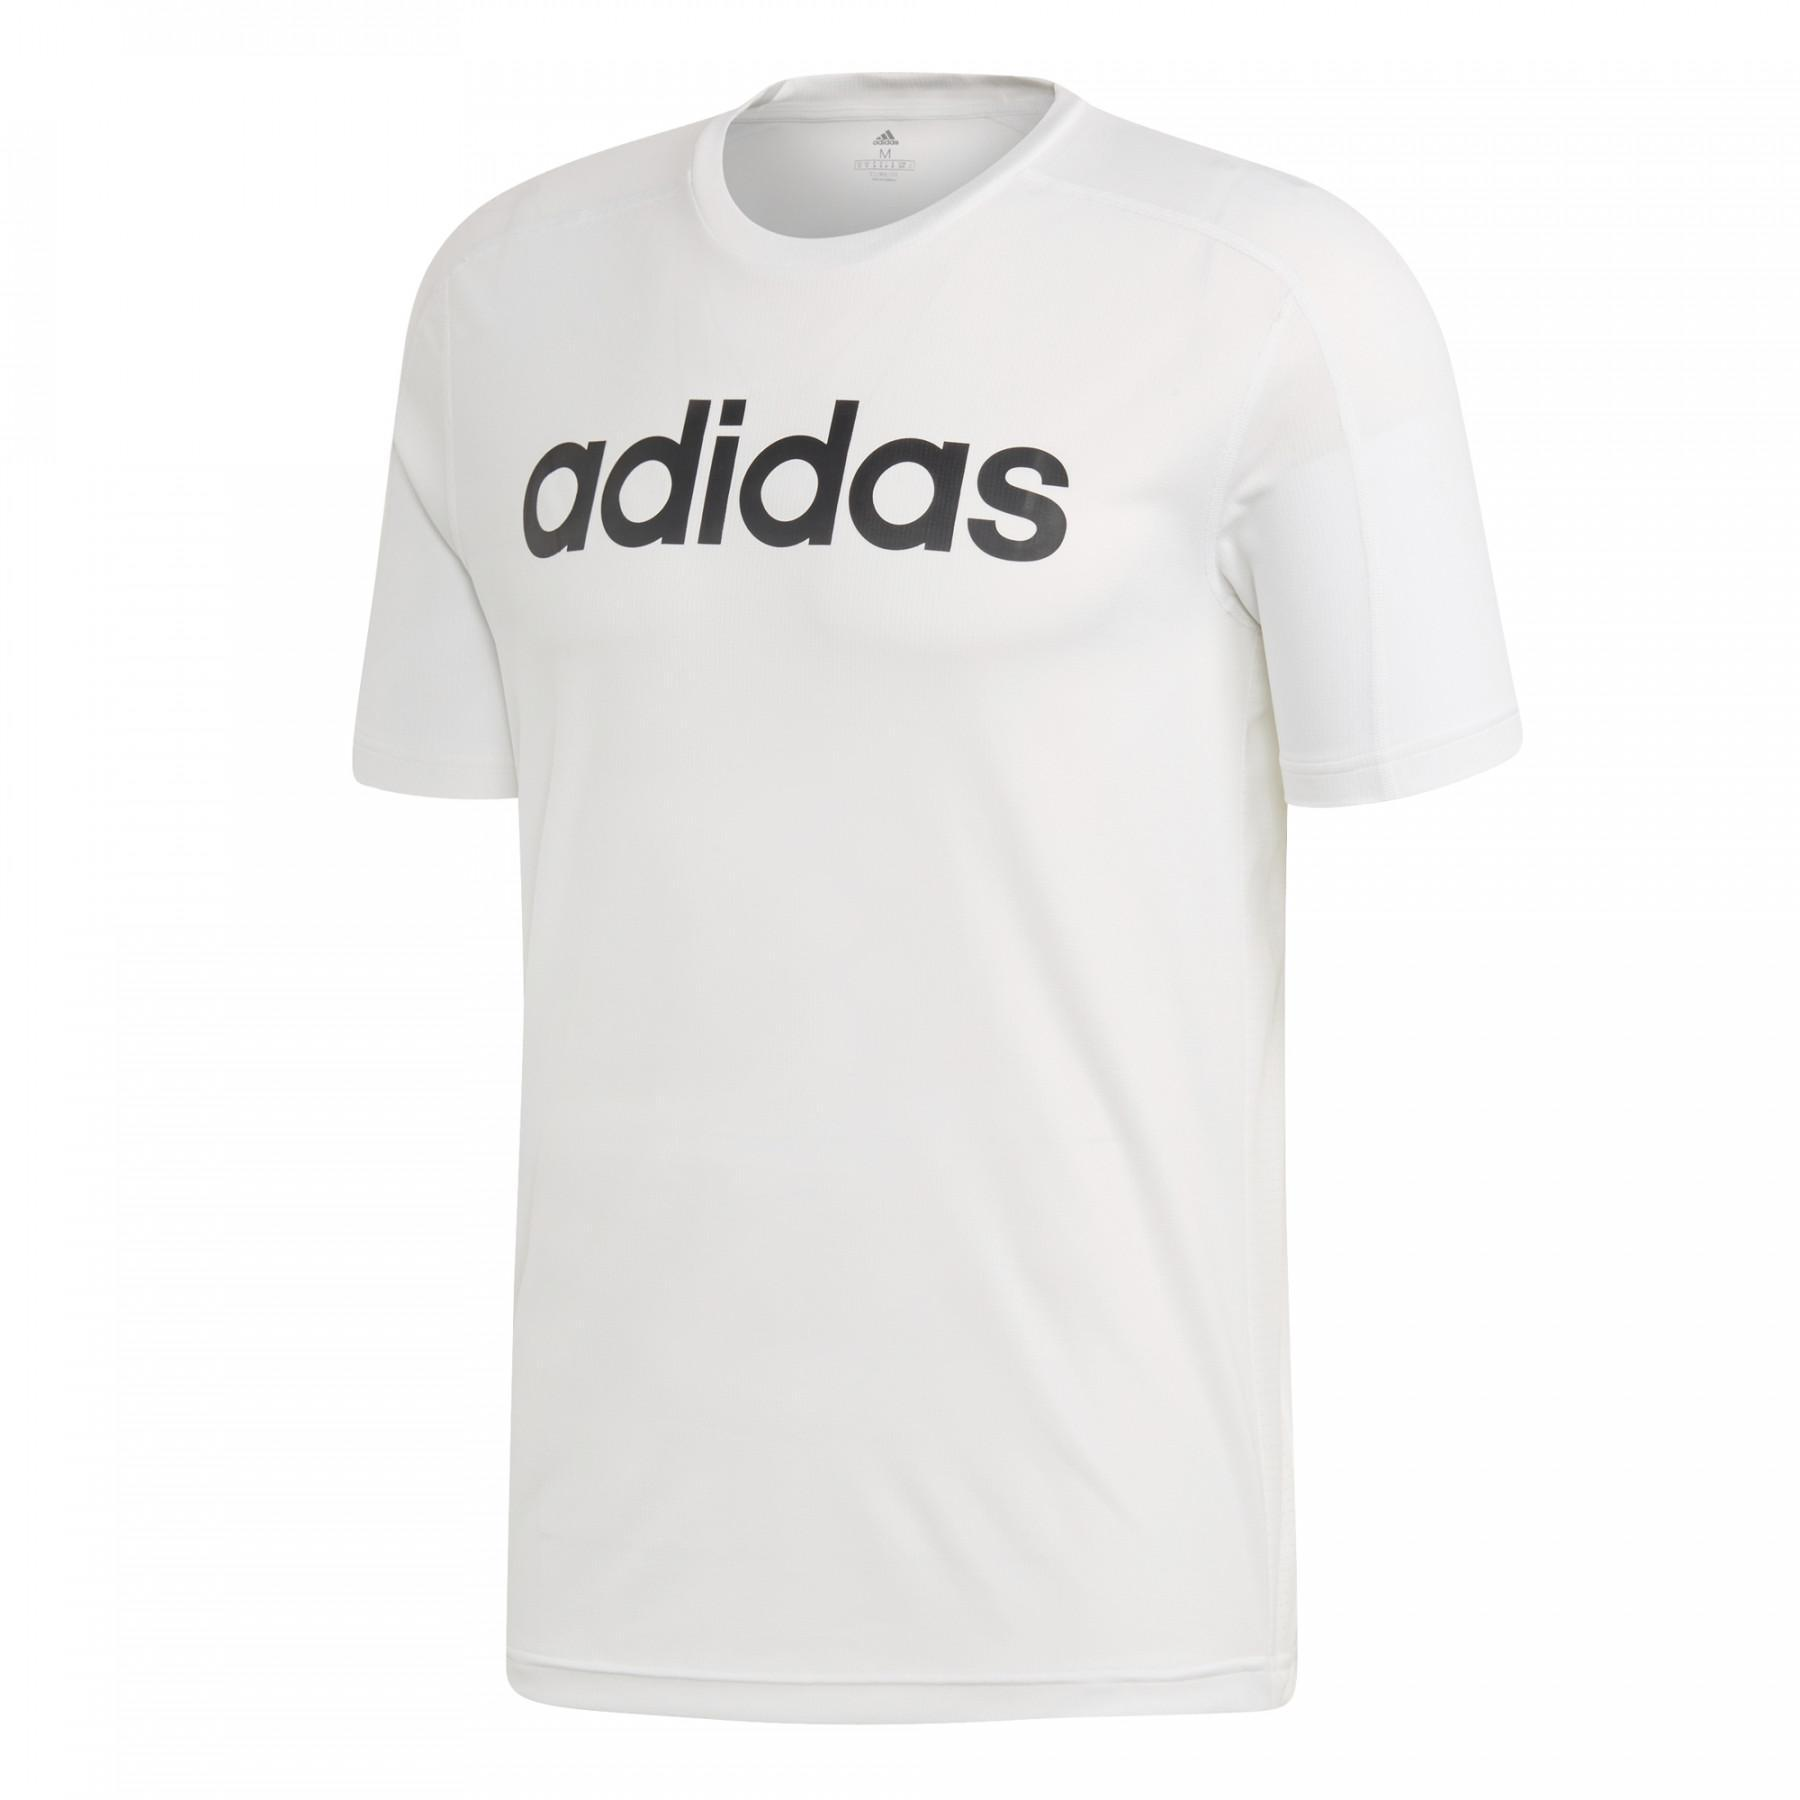 T-shirt adidas Design 2 Move Climacool Logo